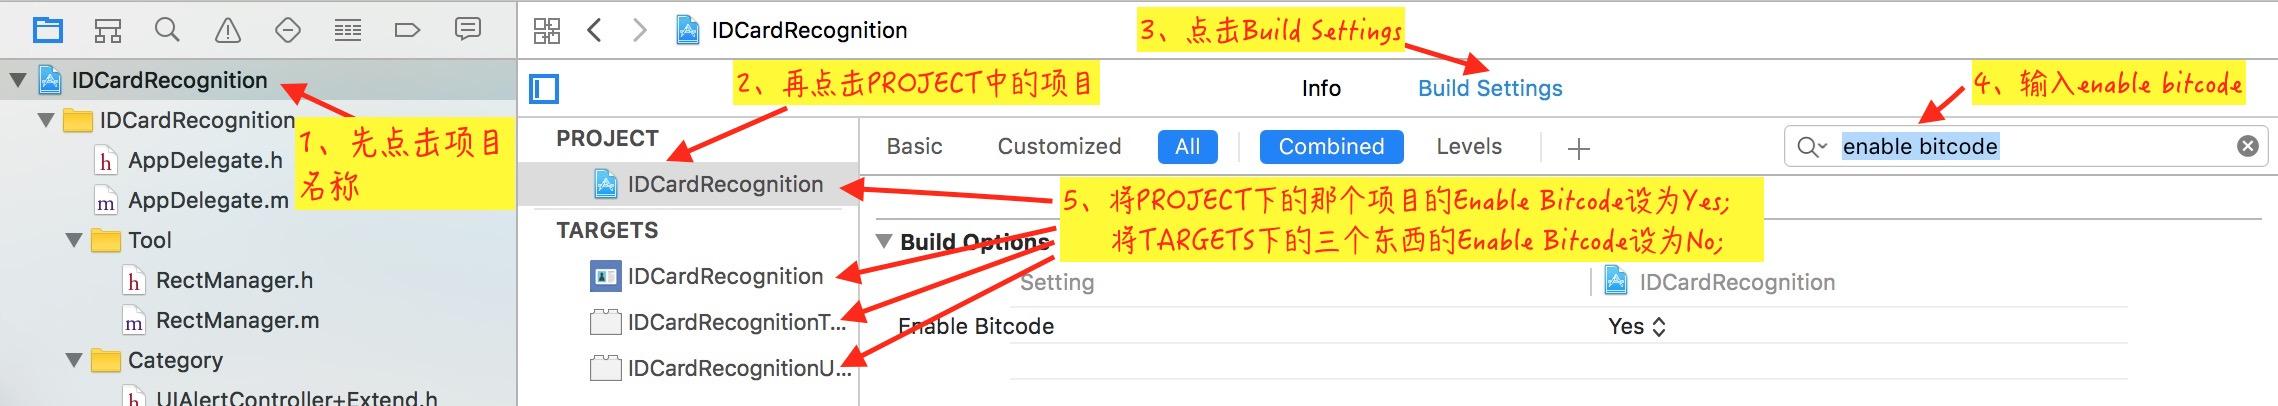 ENABLE_BITCODE Error 解决方法